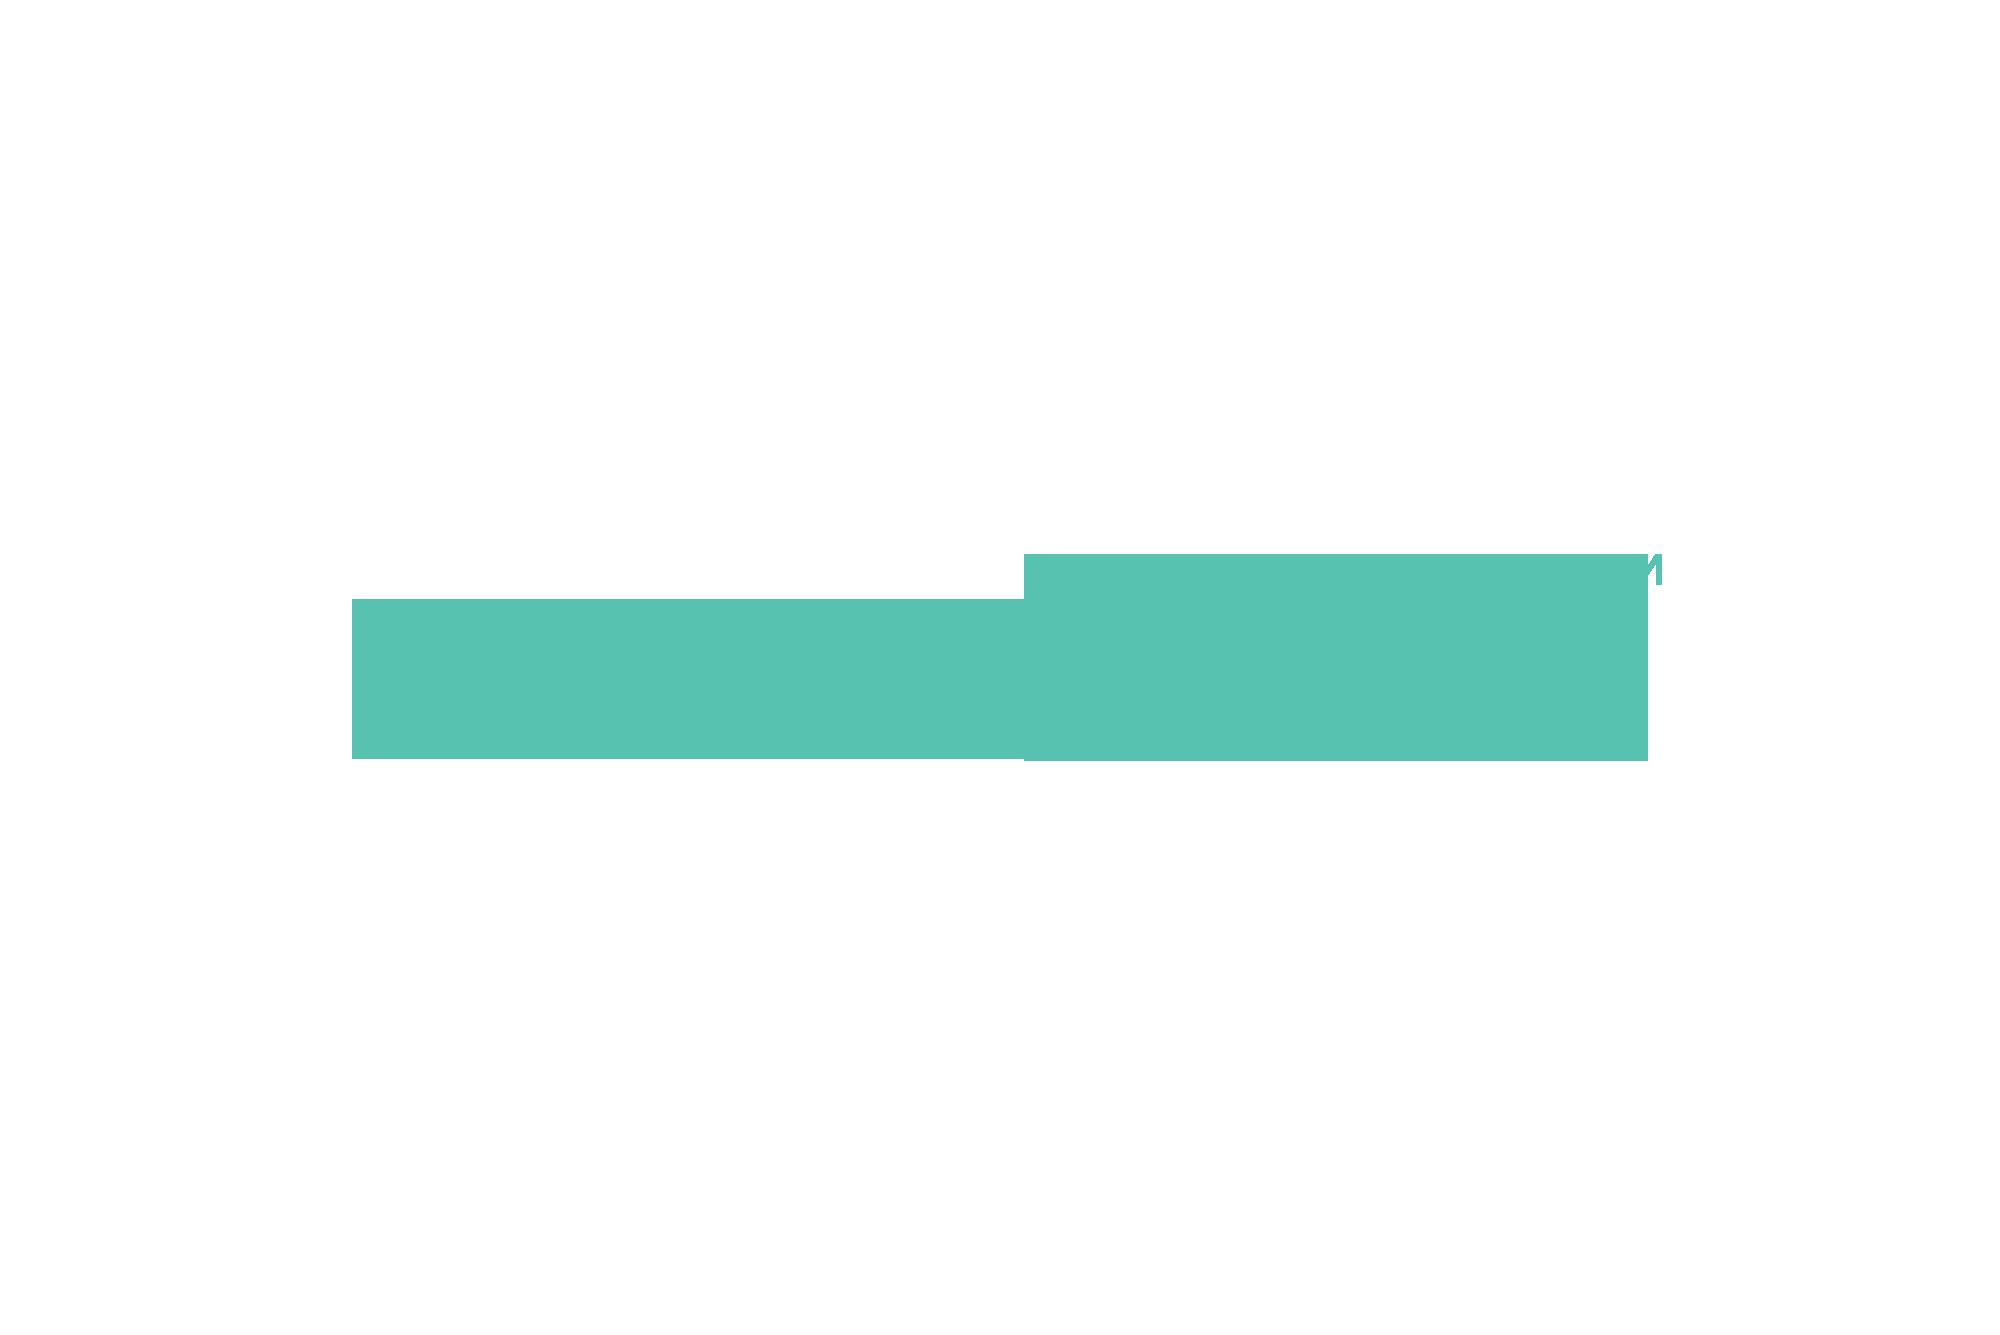 http://dubaipodiatry.com/wp-content/uploads/2015/12/DPC_logos_heelbuzz.png